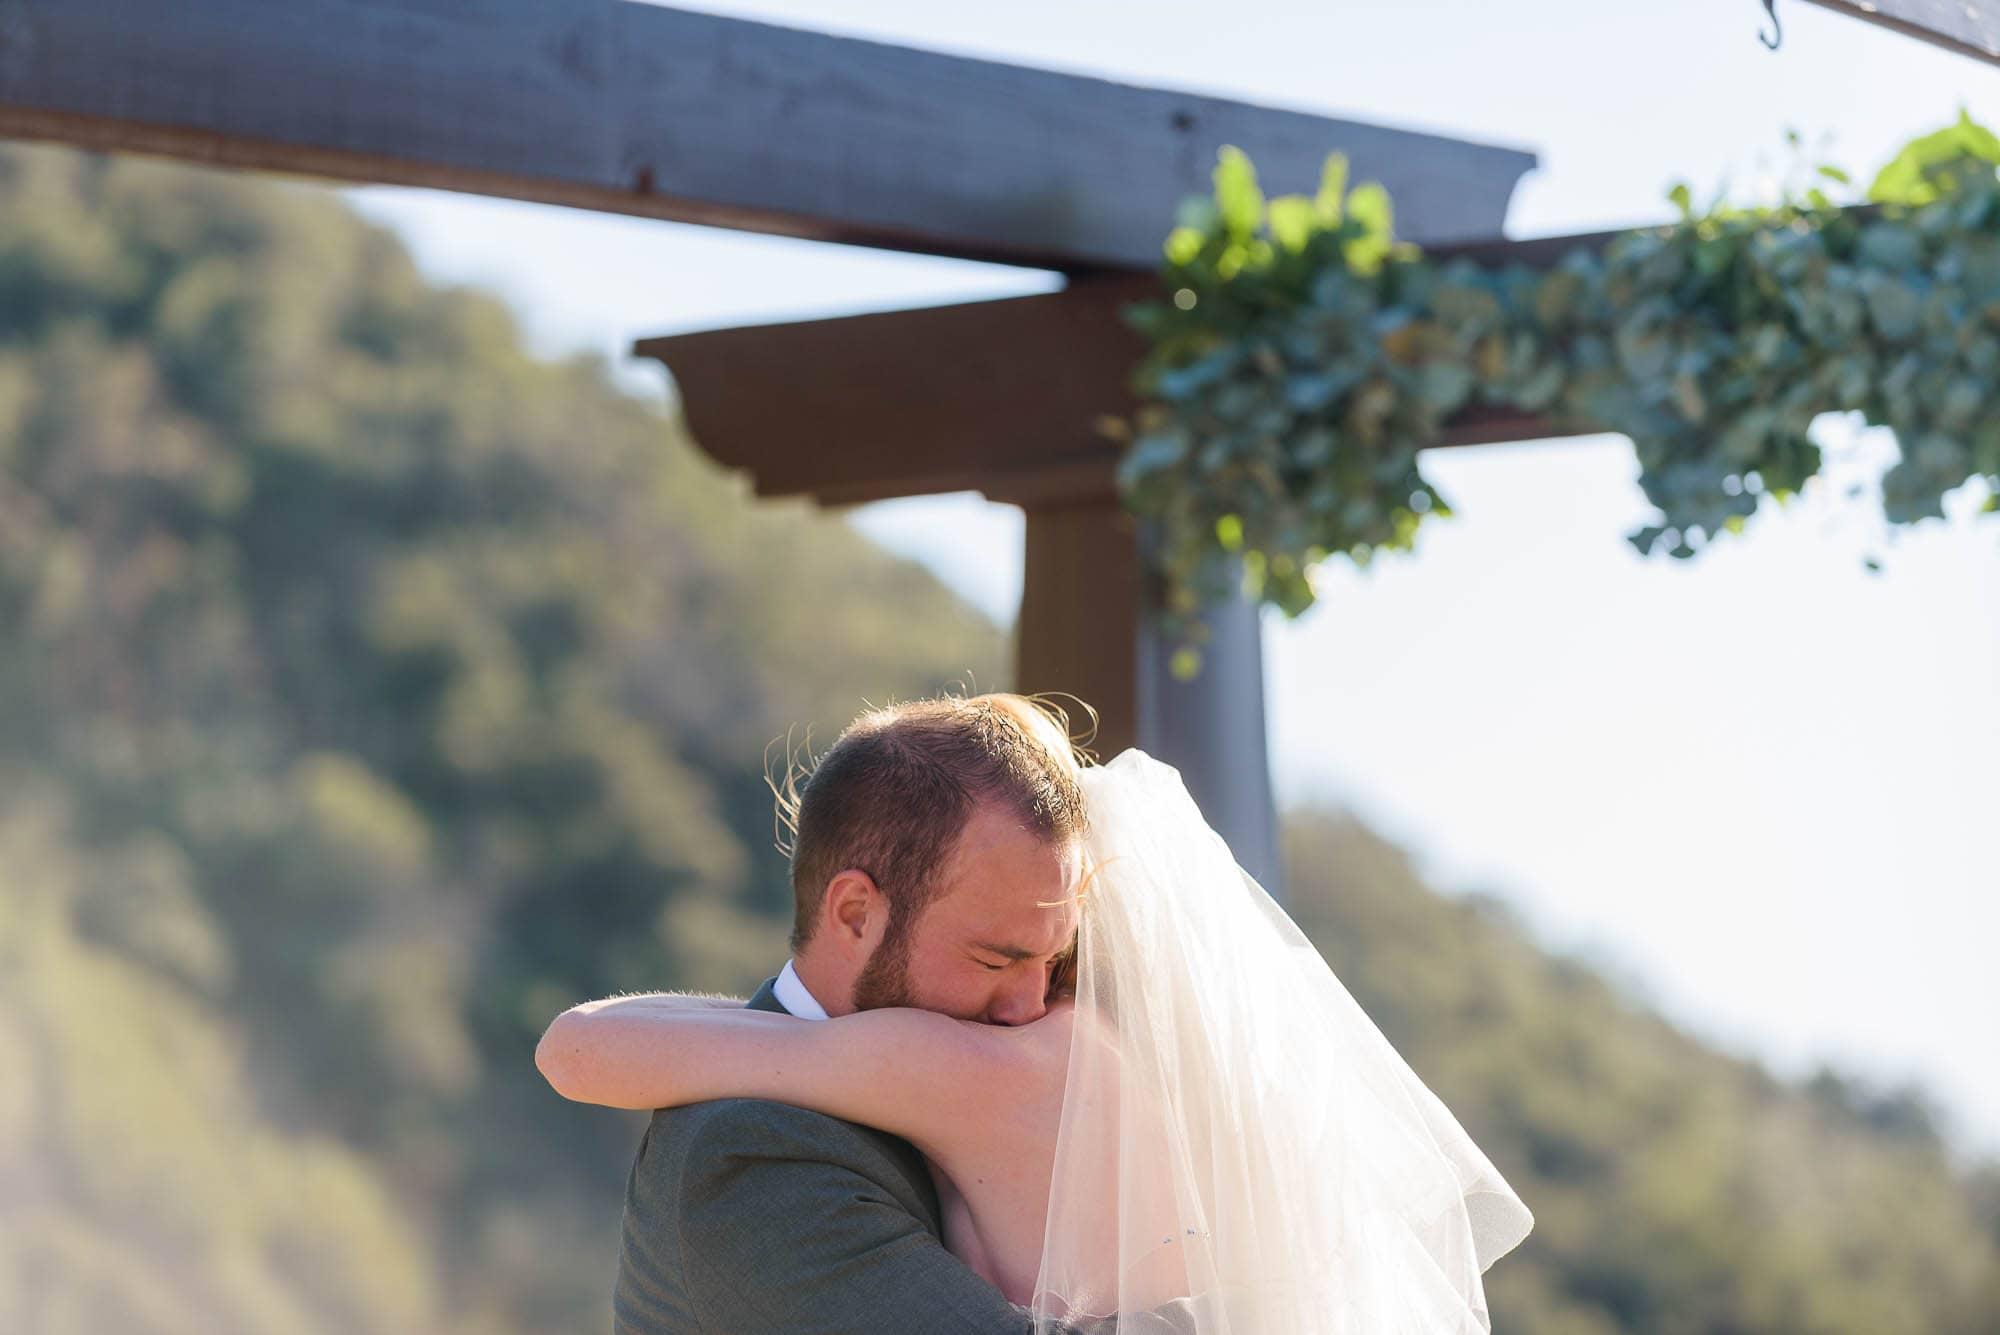 259_Alan_and_Heidi_Serendipity_Garden_Wedding_10-27-2018